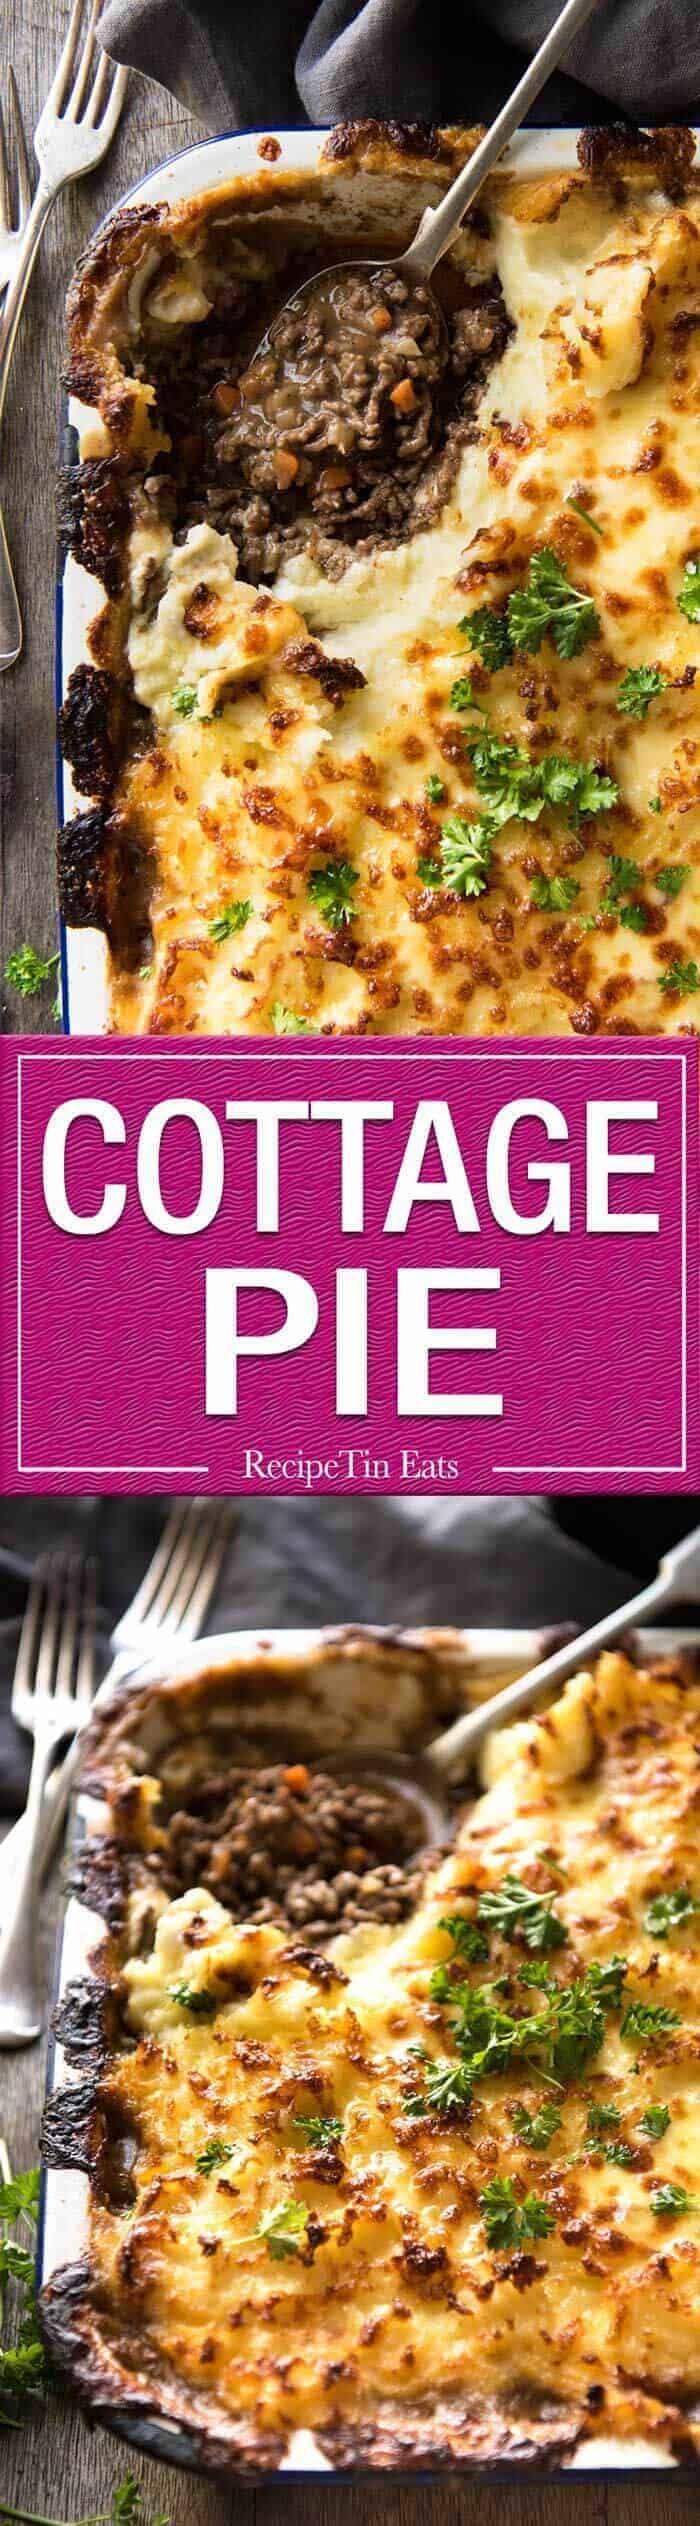 Cottage Pie | Recipe in 2020 | Cottage pie, Recipetin eats ...